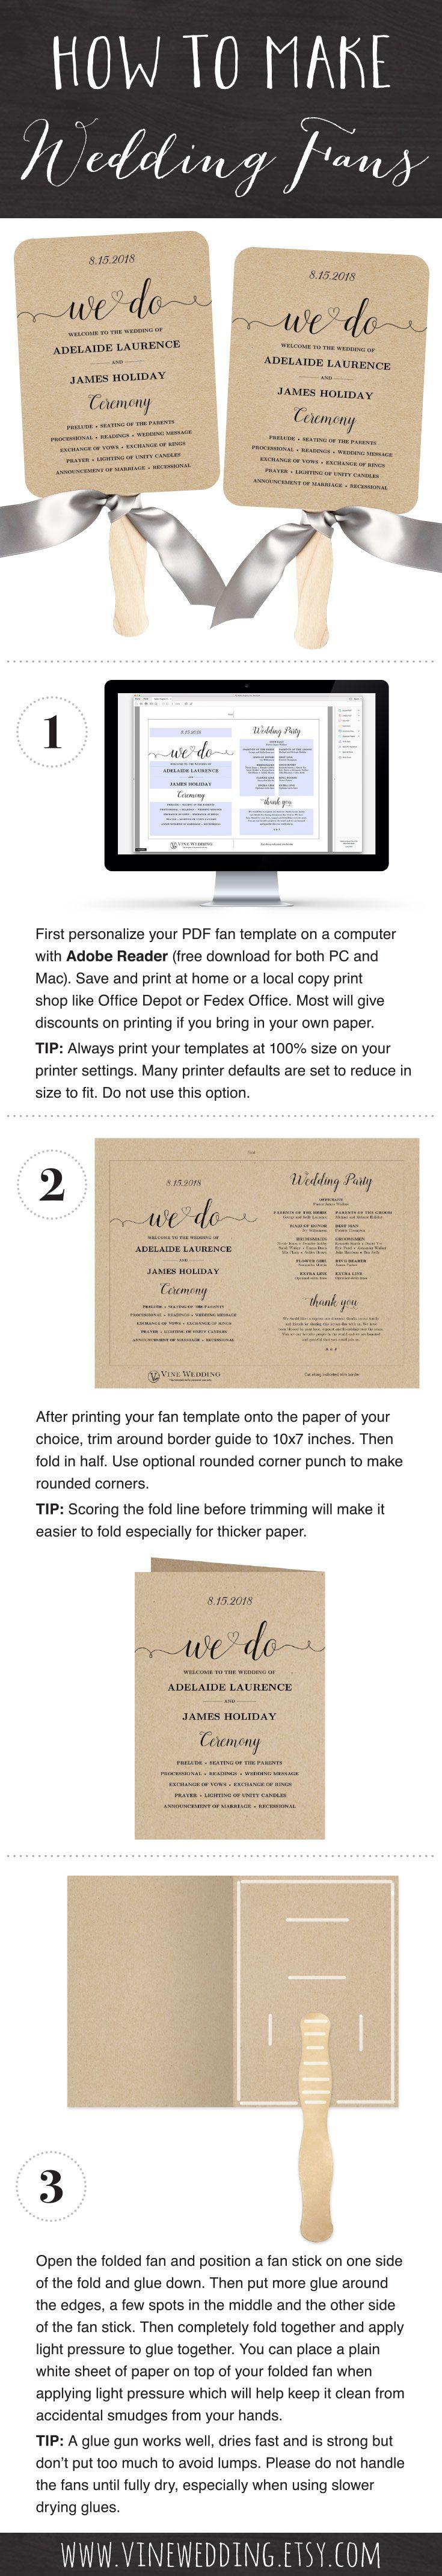 Make your own wedding fans  Easy DIY printable wedding fan templates